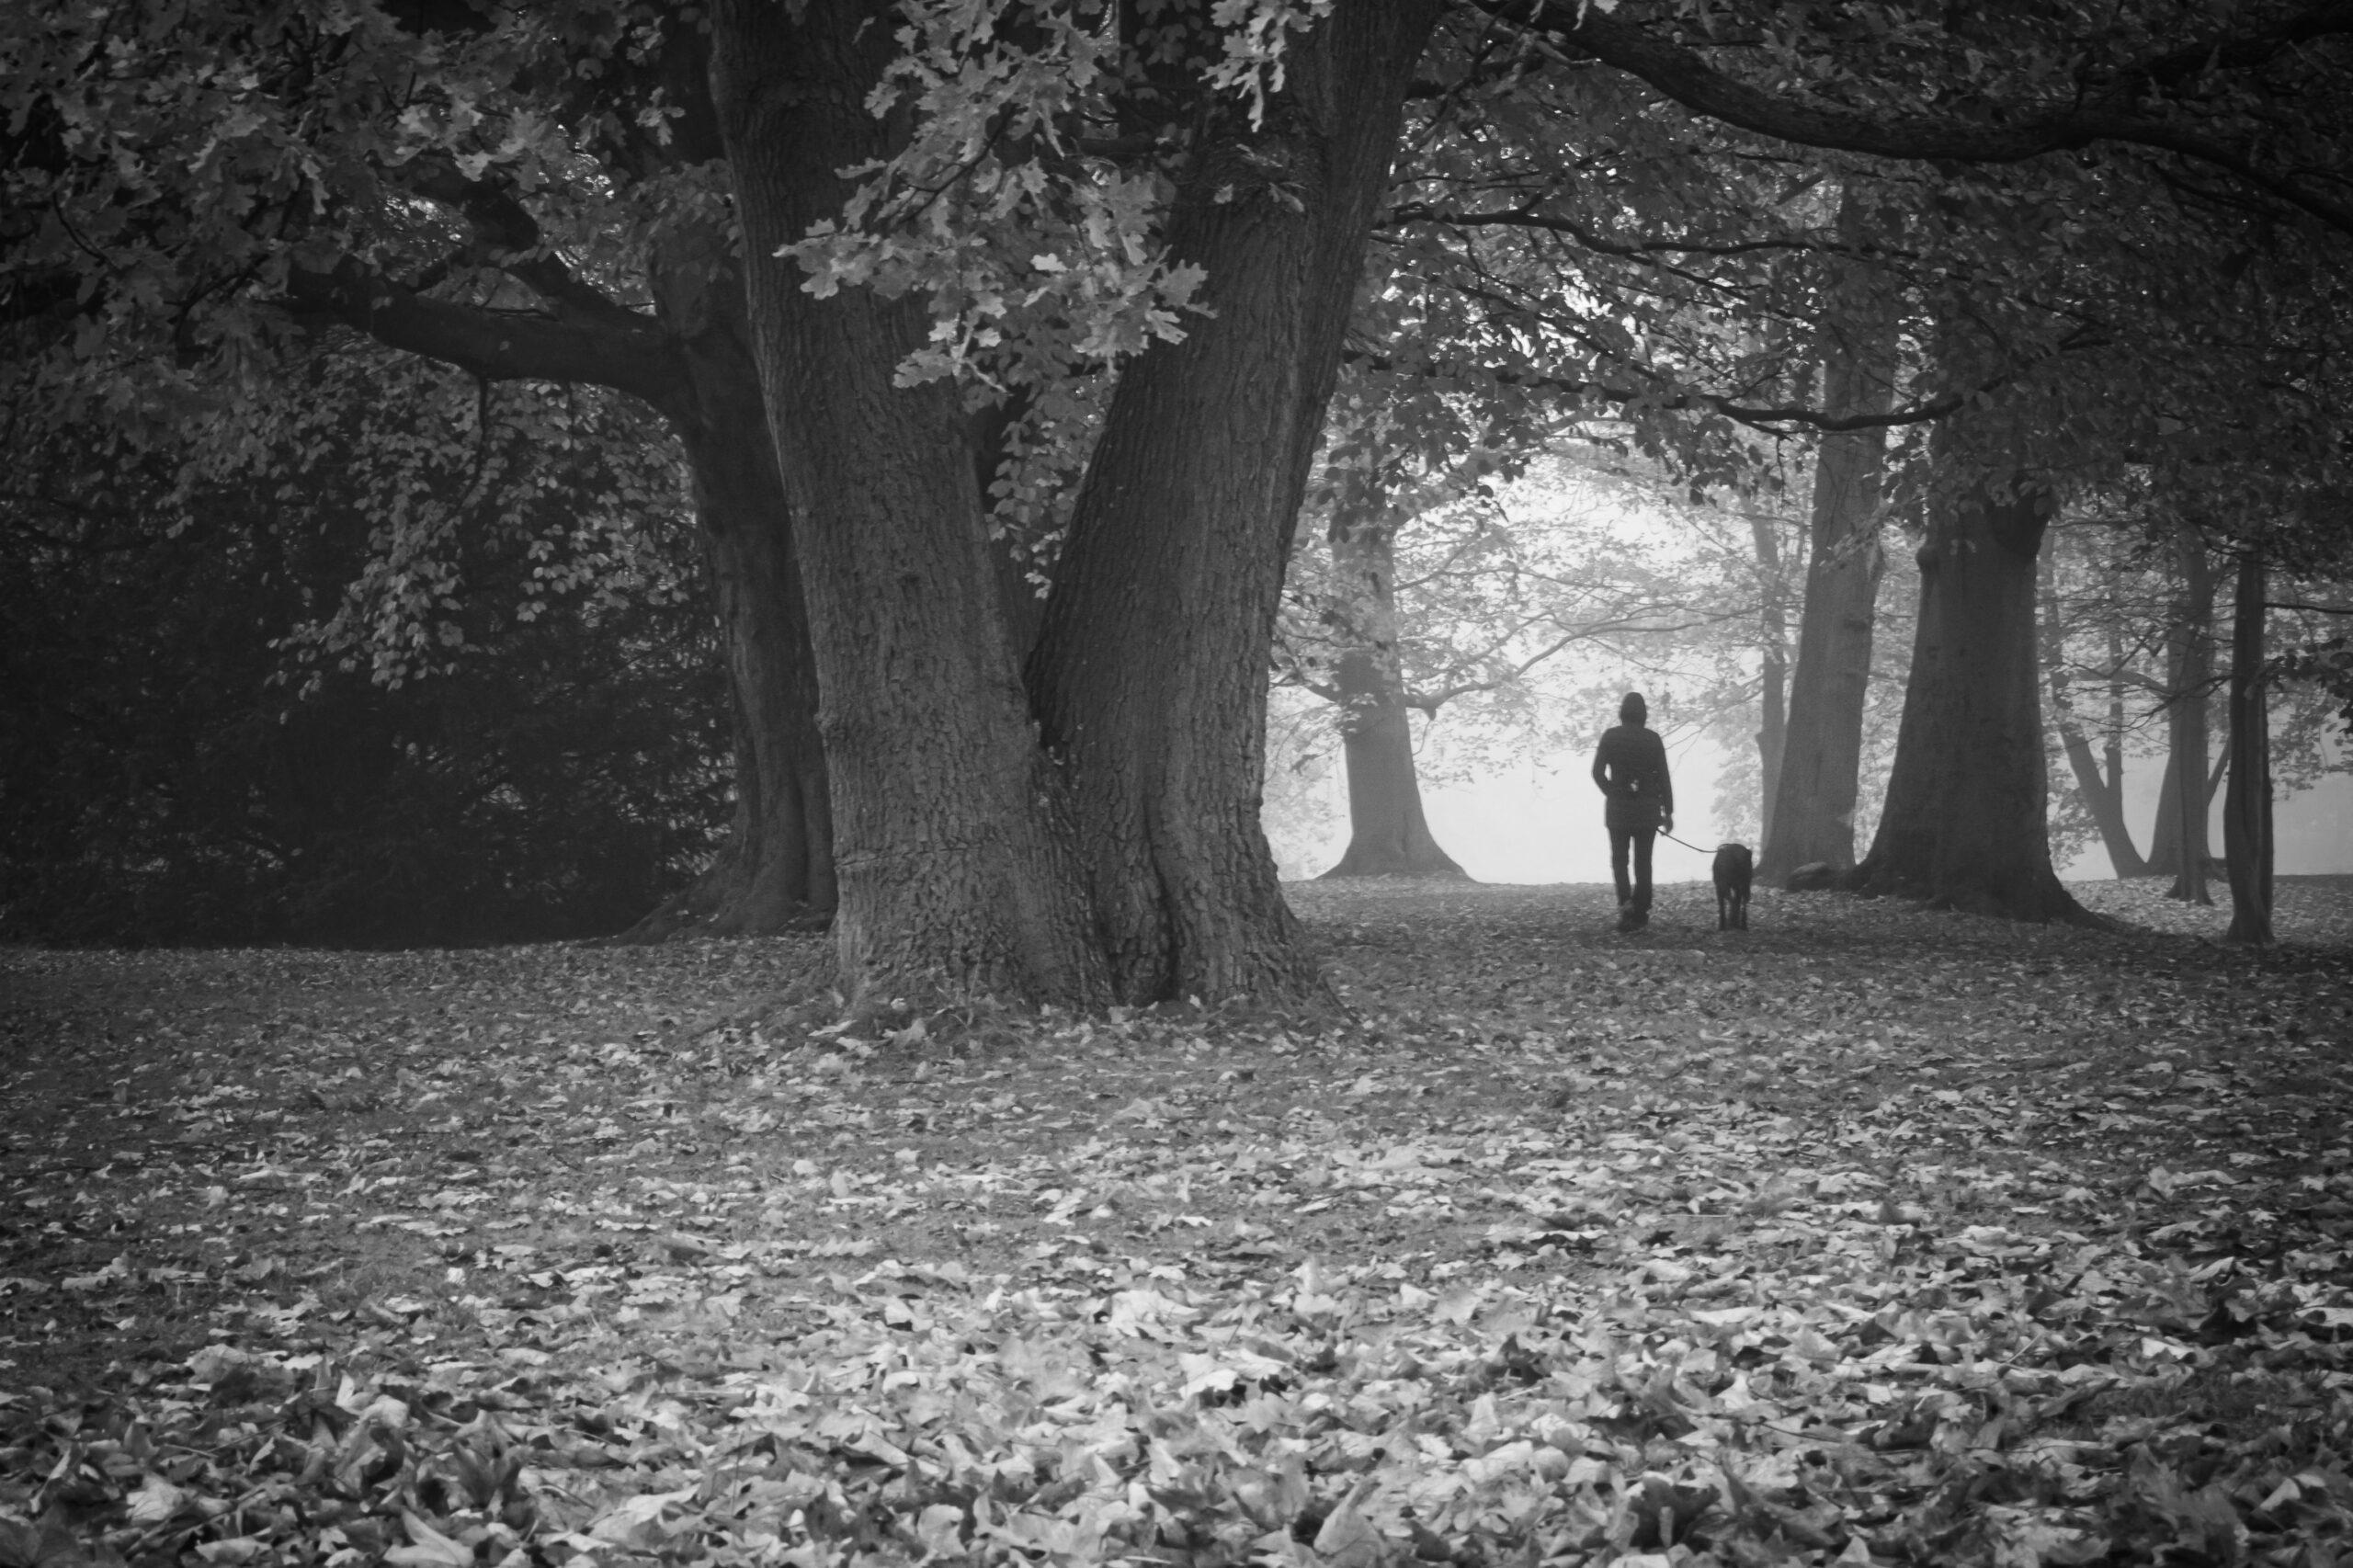 Streetfotografie Wald